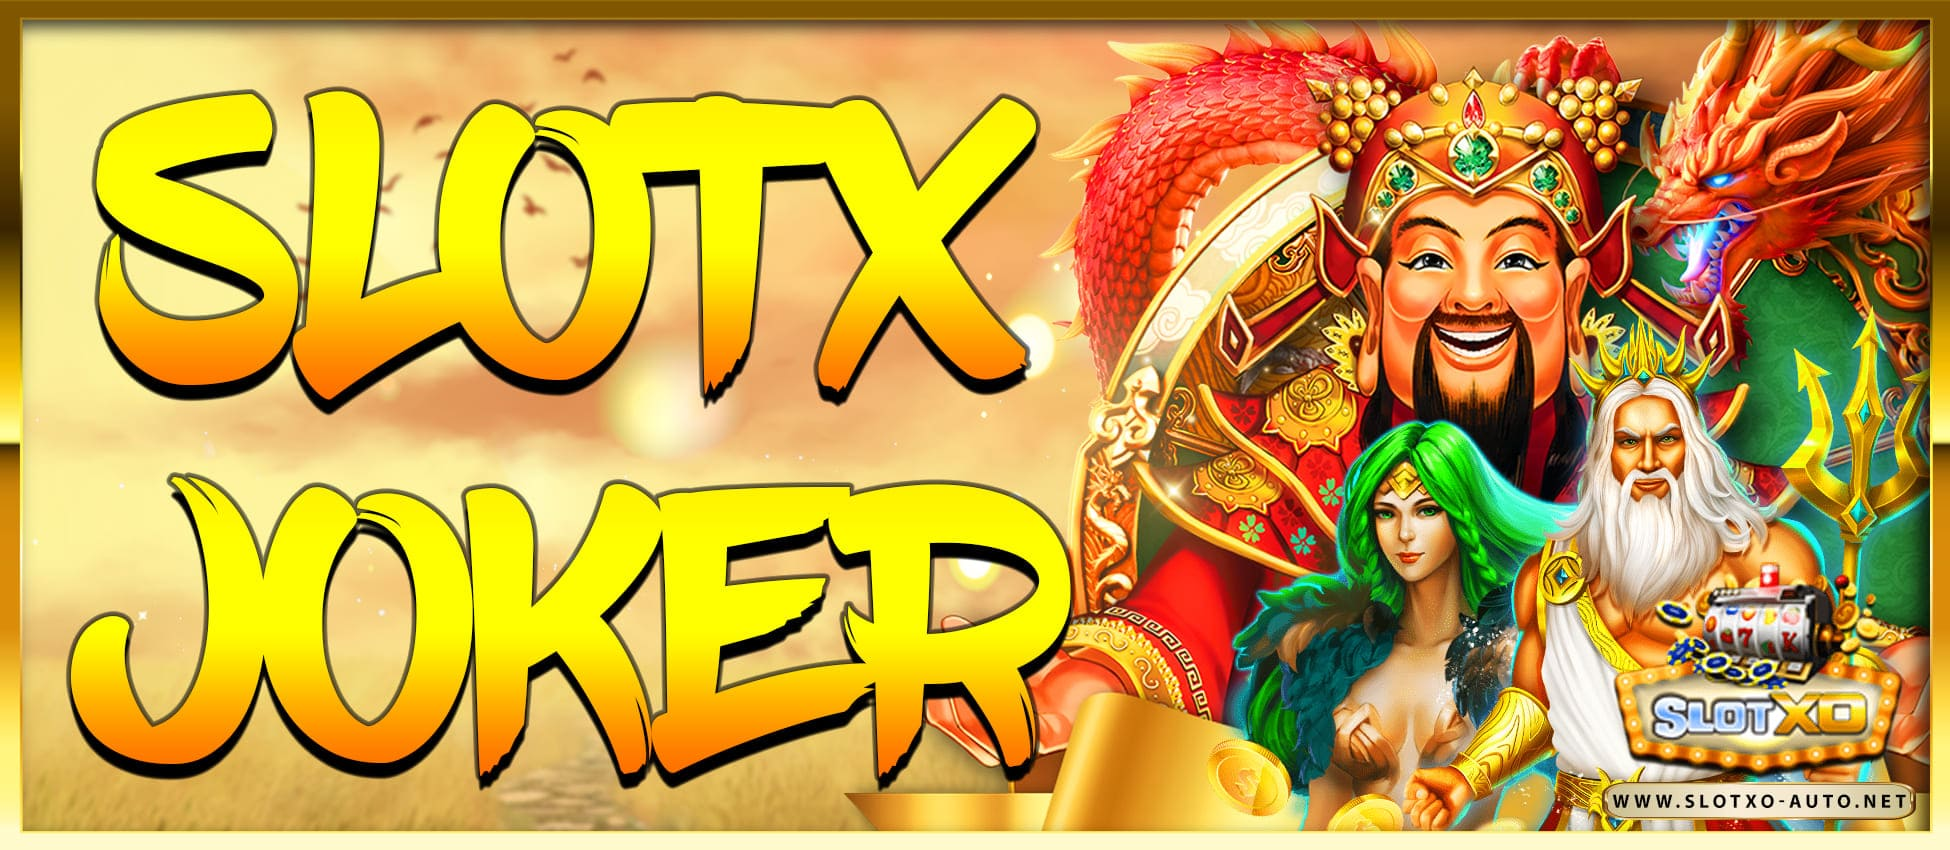 slotxo joker สล็อตออนไลน์ ฟรีเครดิต 50